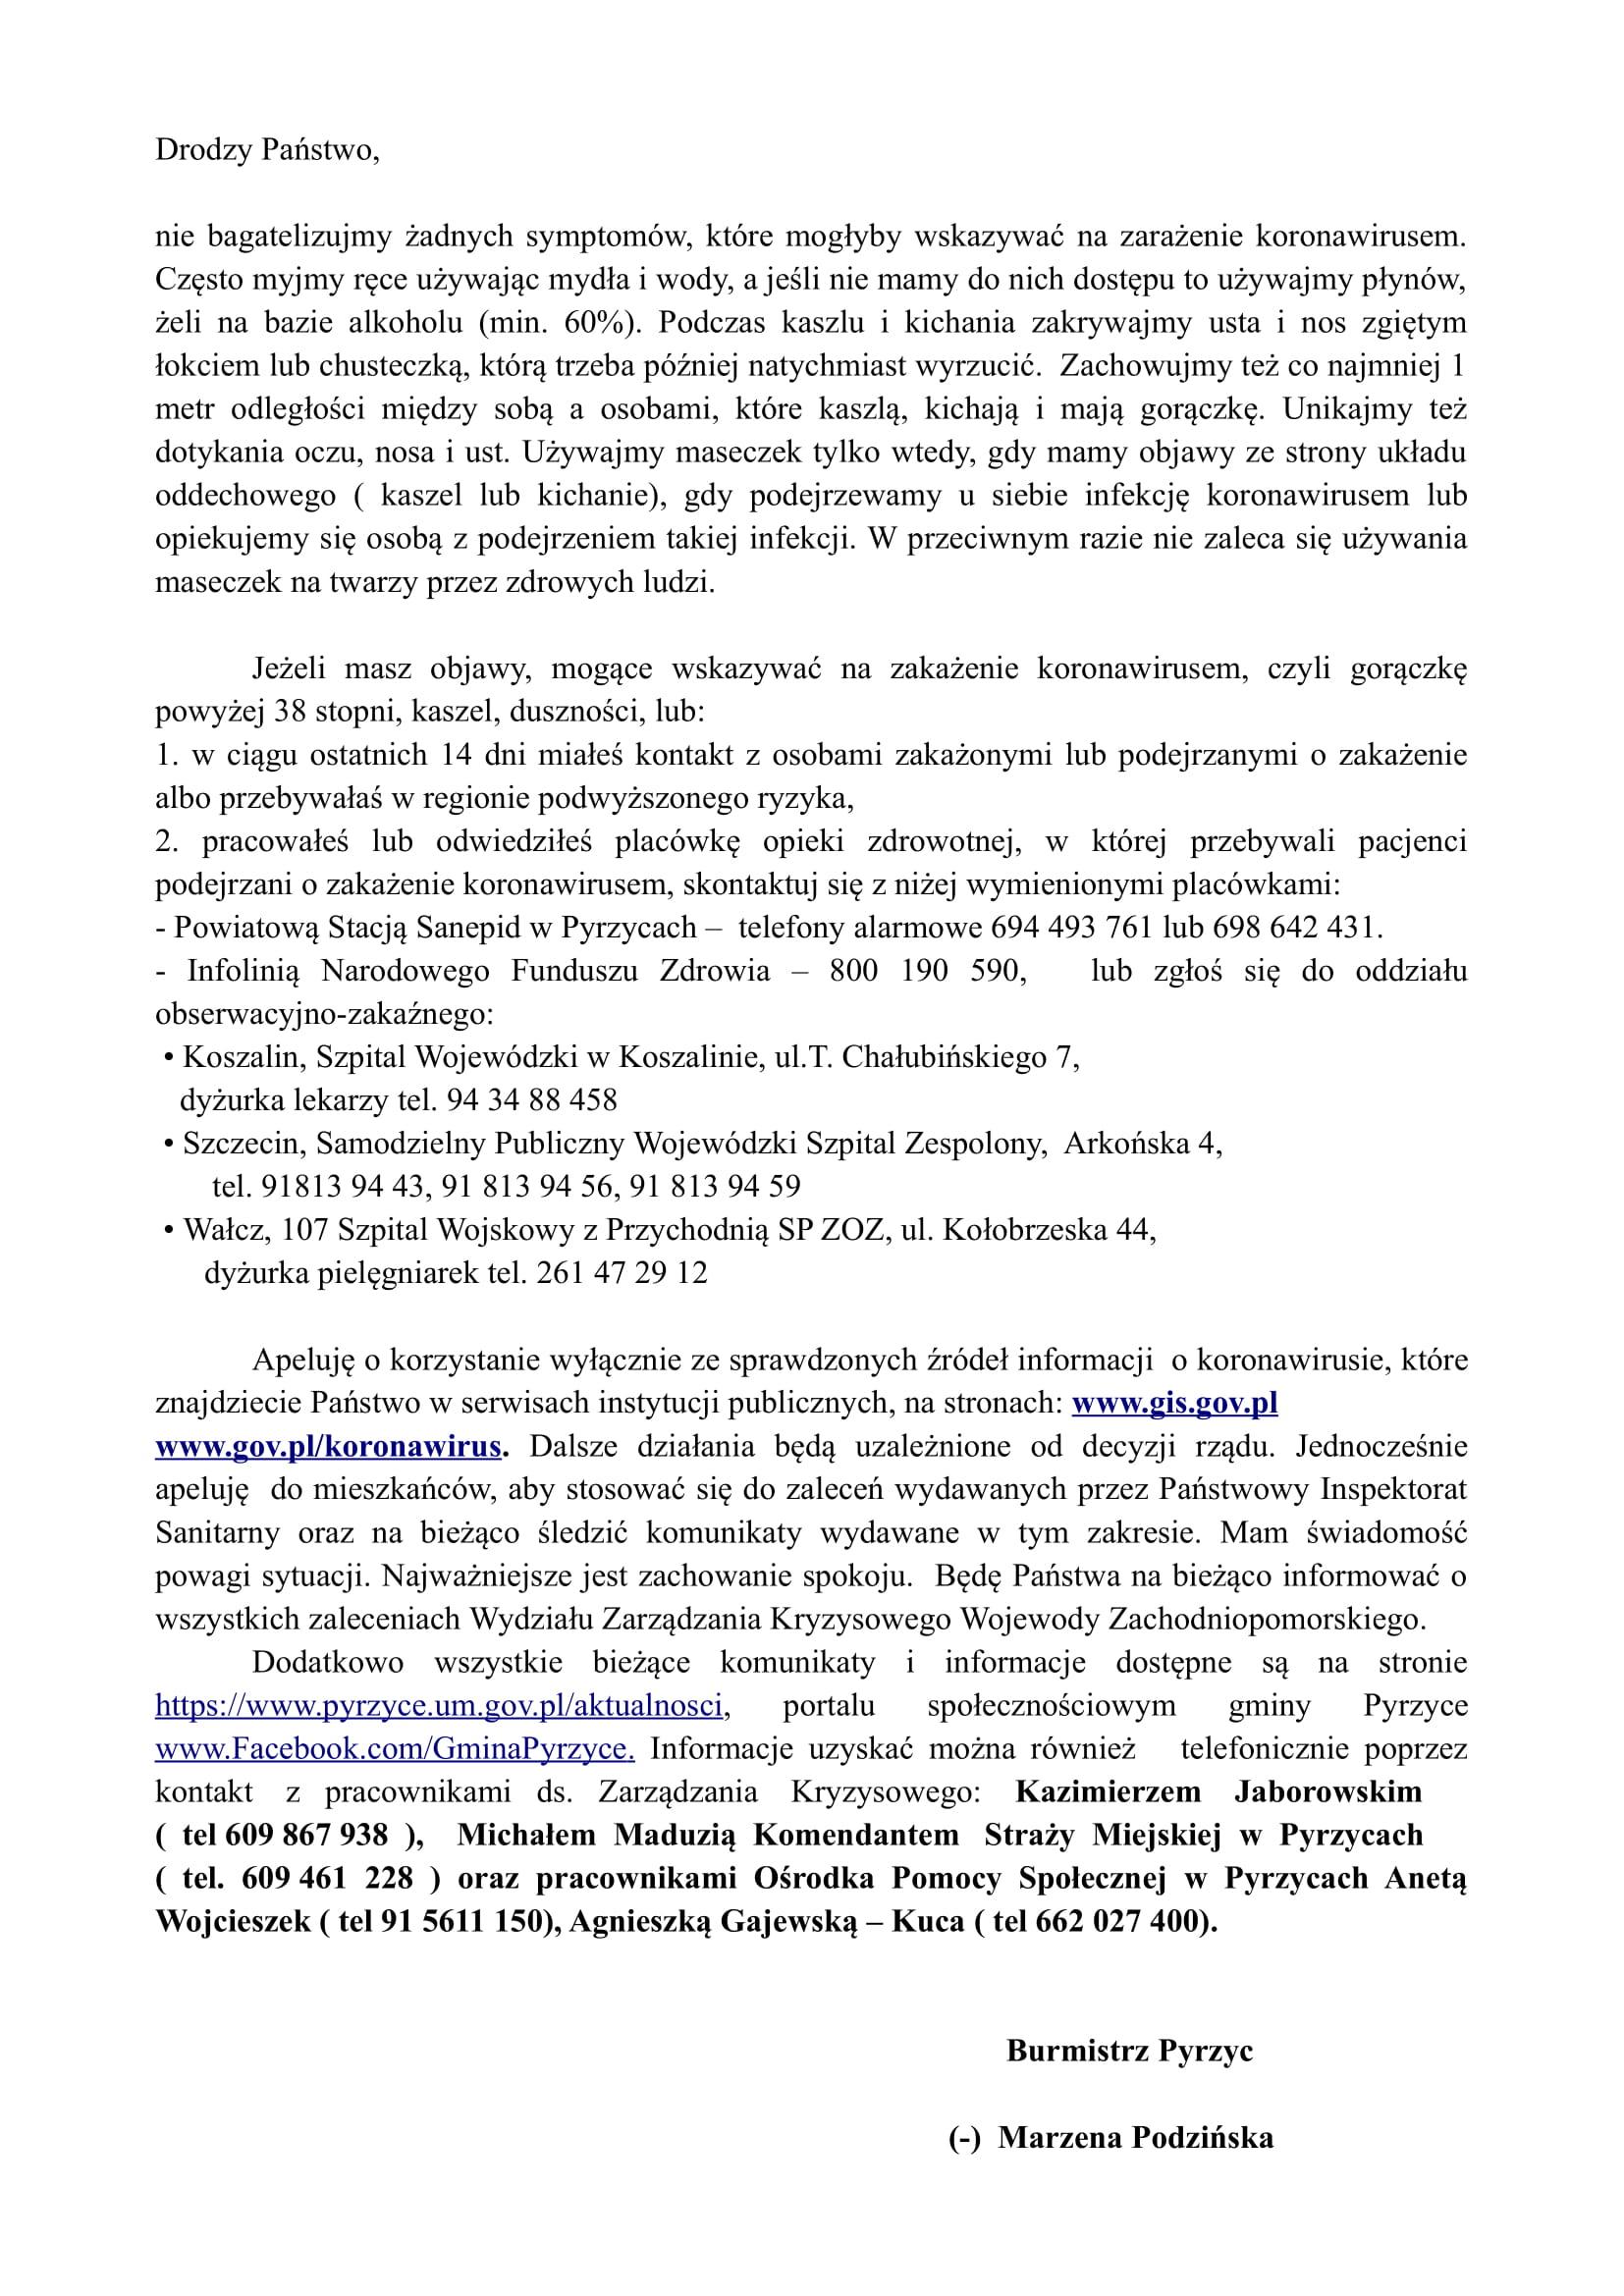 Komunikat Burmistrza.doc 2-2-1-2